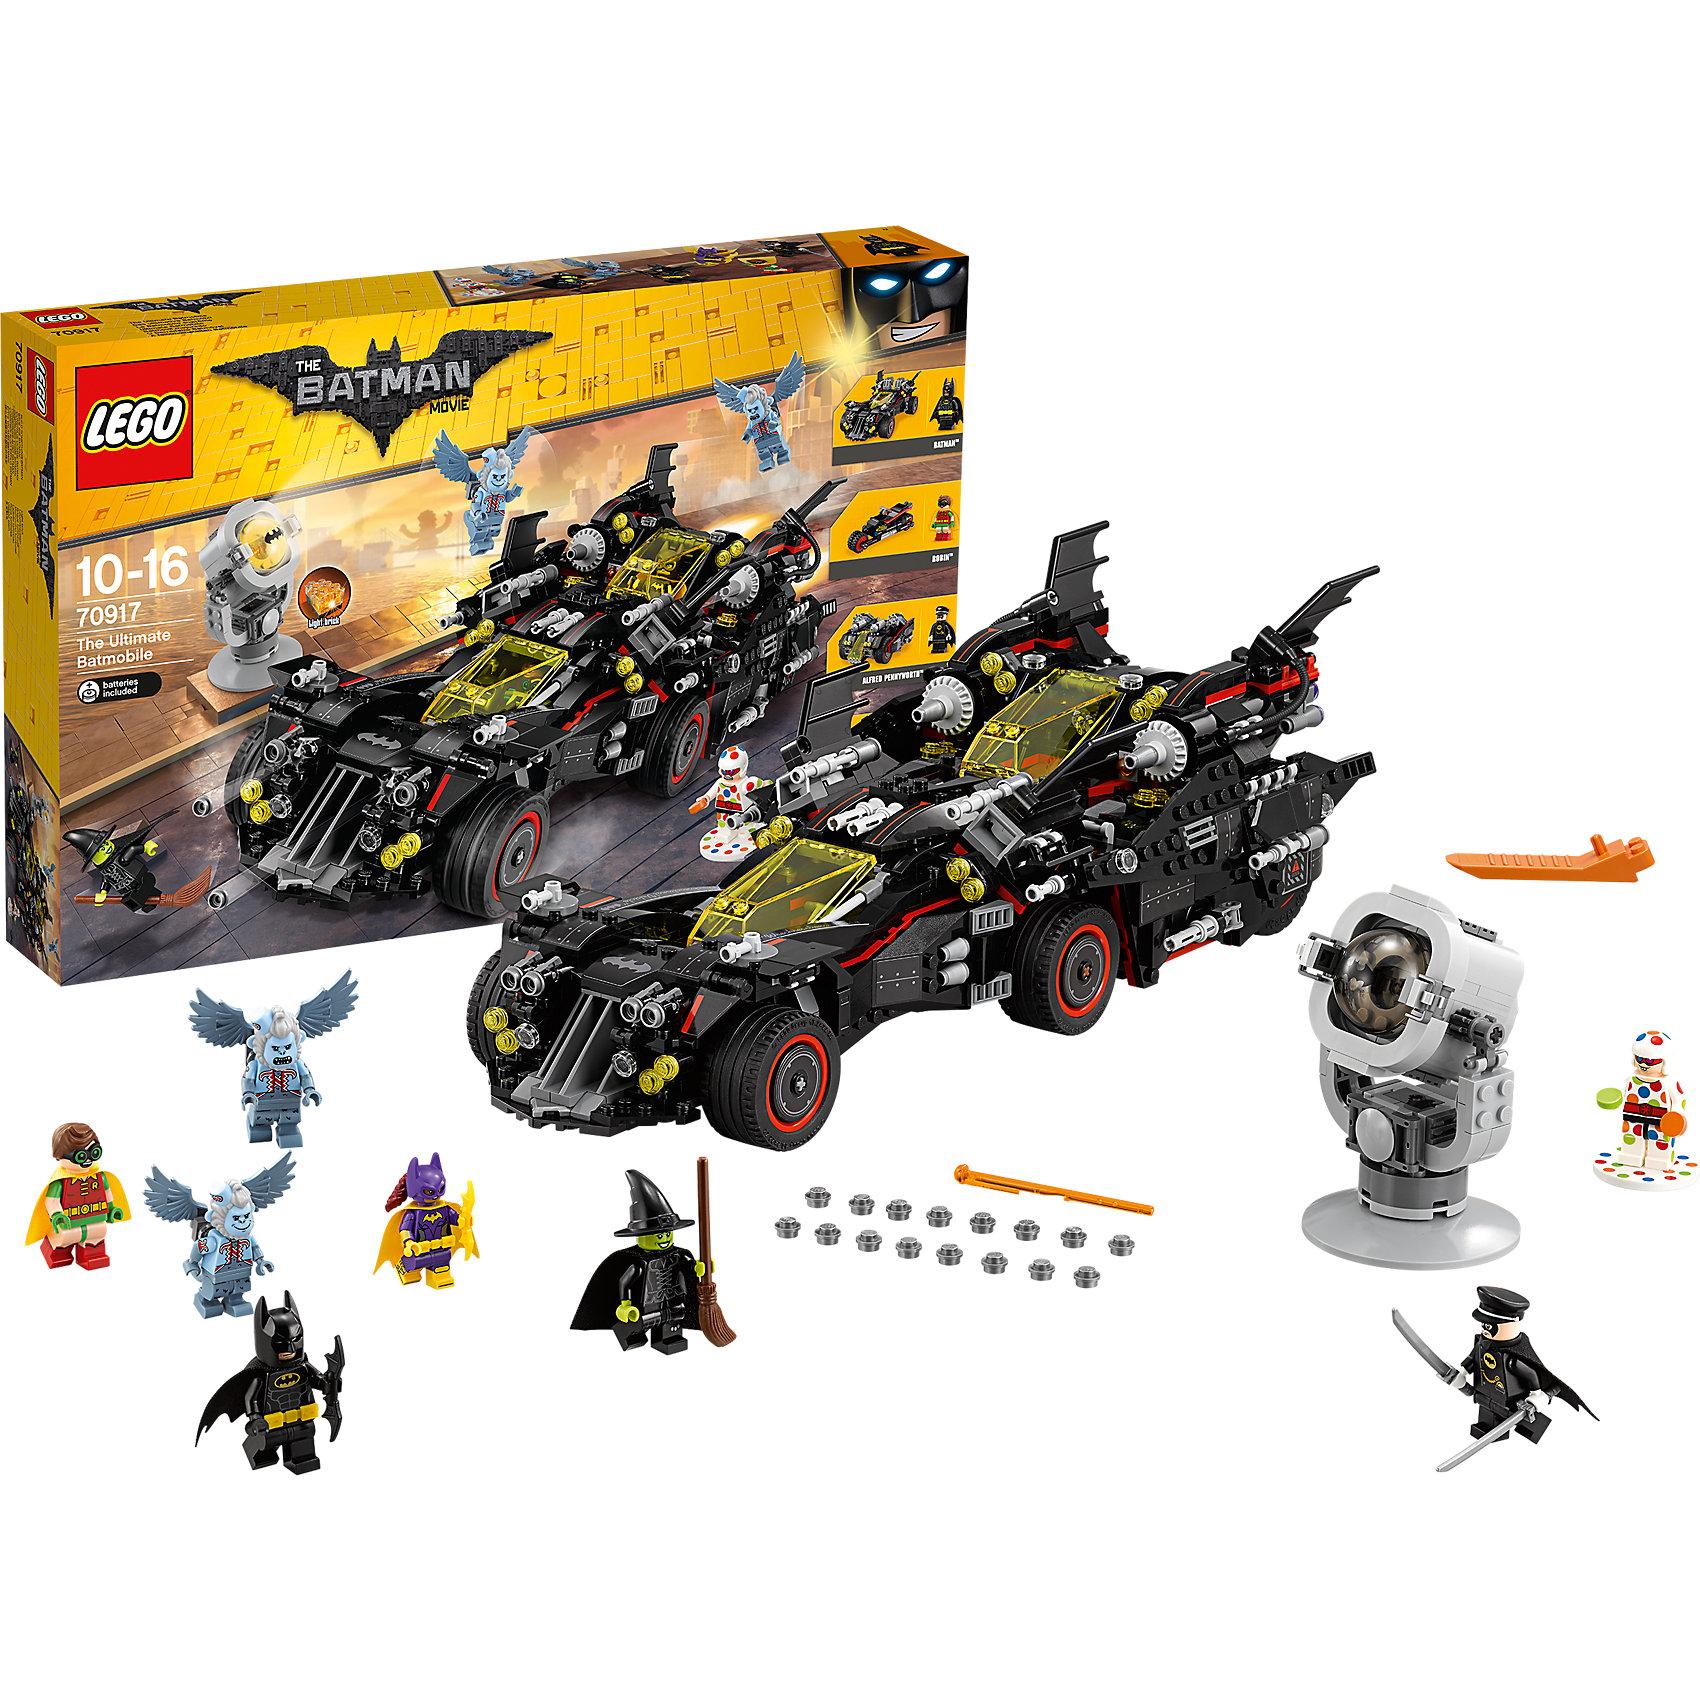 LEGO Batman Movie 70917: Крутой БэтмобильПластмассовые конструкторы<br><br><br>Ширина мм: 583<br>Глубина мм: 378<br>Высота мм: 96<br>Вес г: 1959<br>Возраст от месяцев: 120<br>Возраст до месяцев: 192<br>Пол: Мужской<br>Возраст: Детский<br>SKU: 5620005